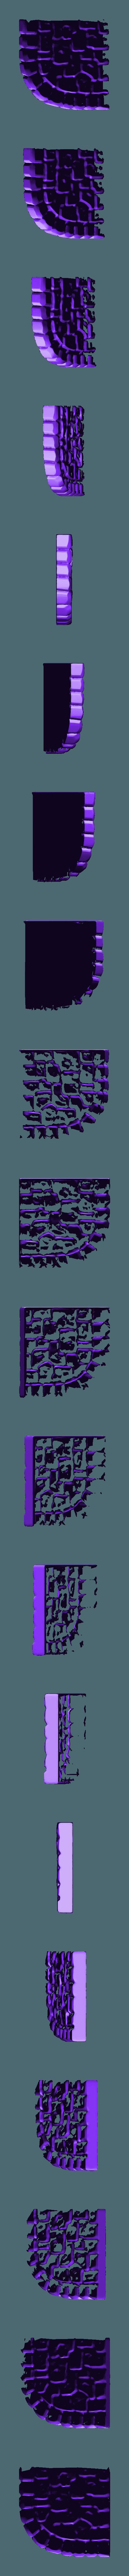 street_corner.stl Download free STL file Fantasy city set • 3D printable model, HeribertoValle